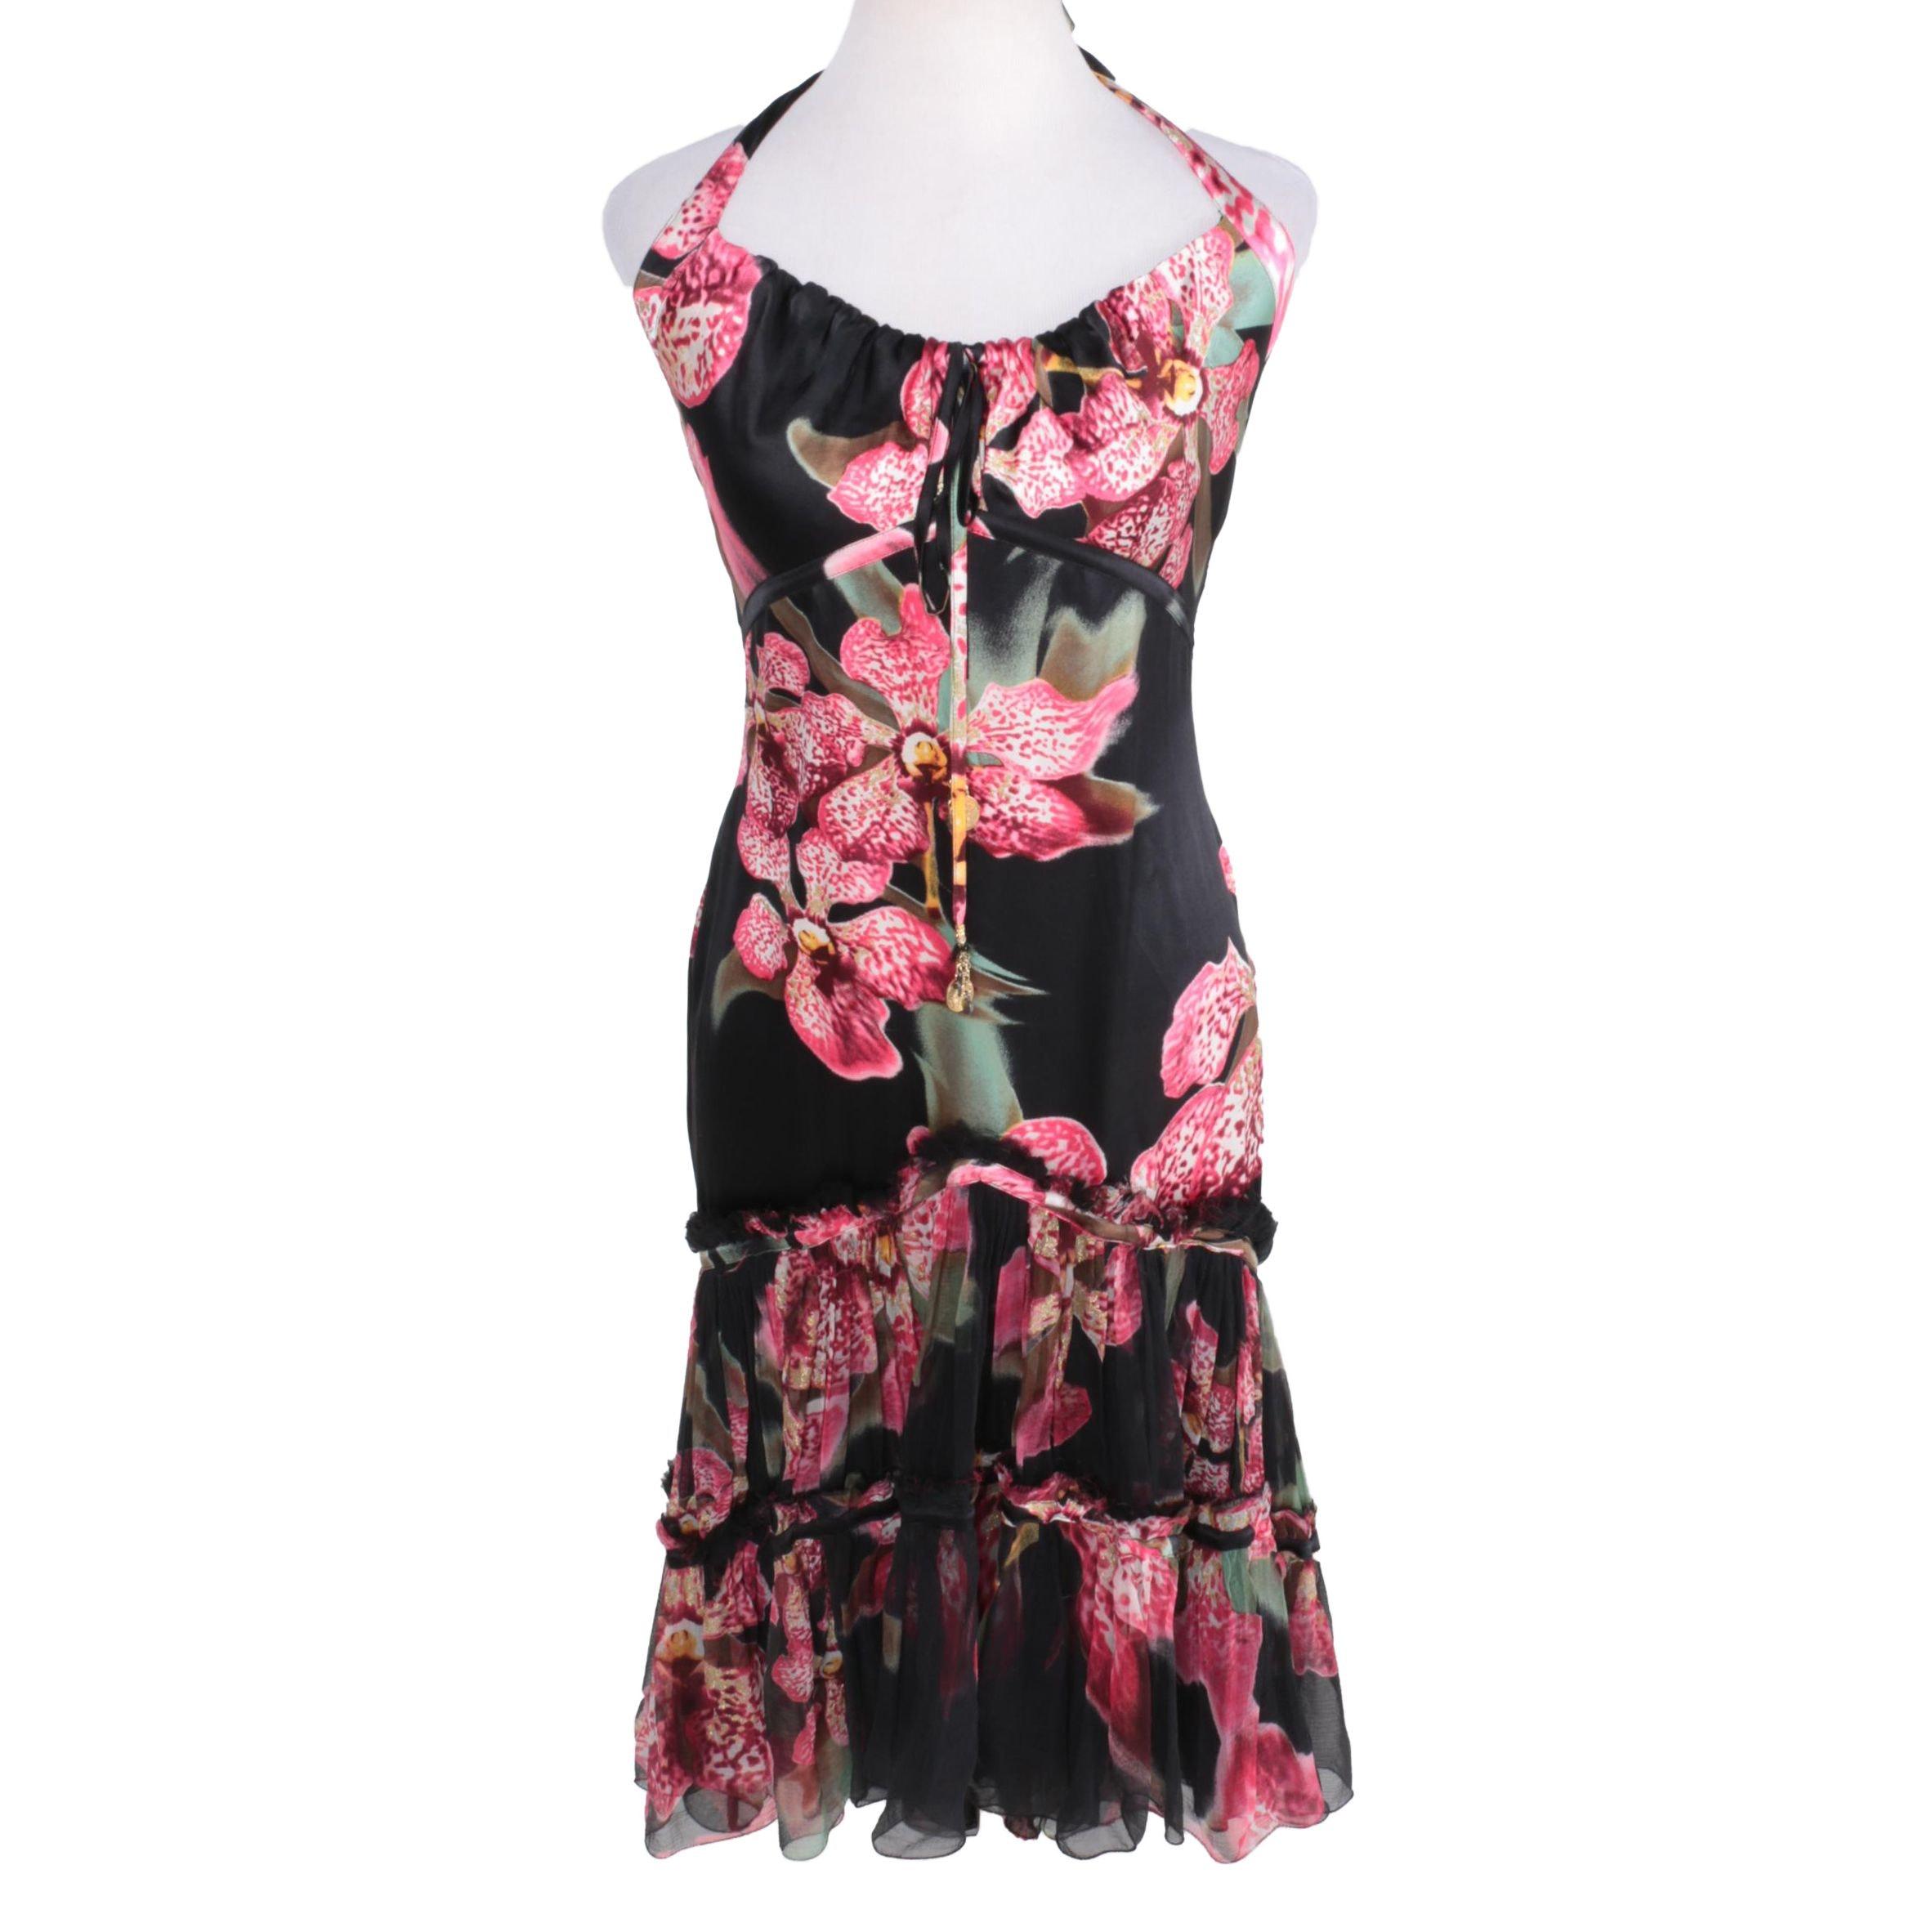 Roberto Cavalli Floral Print Halter Dress